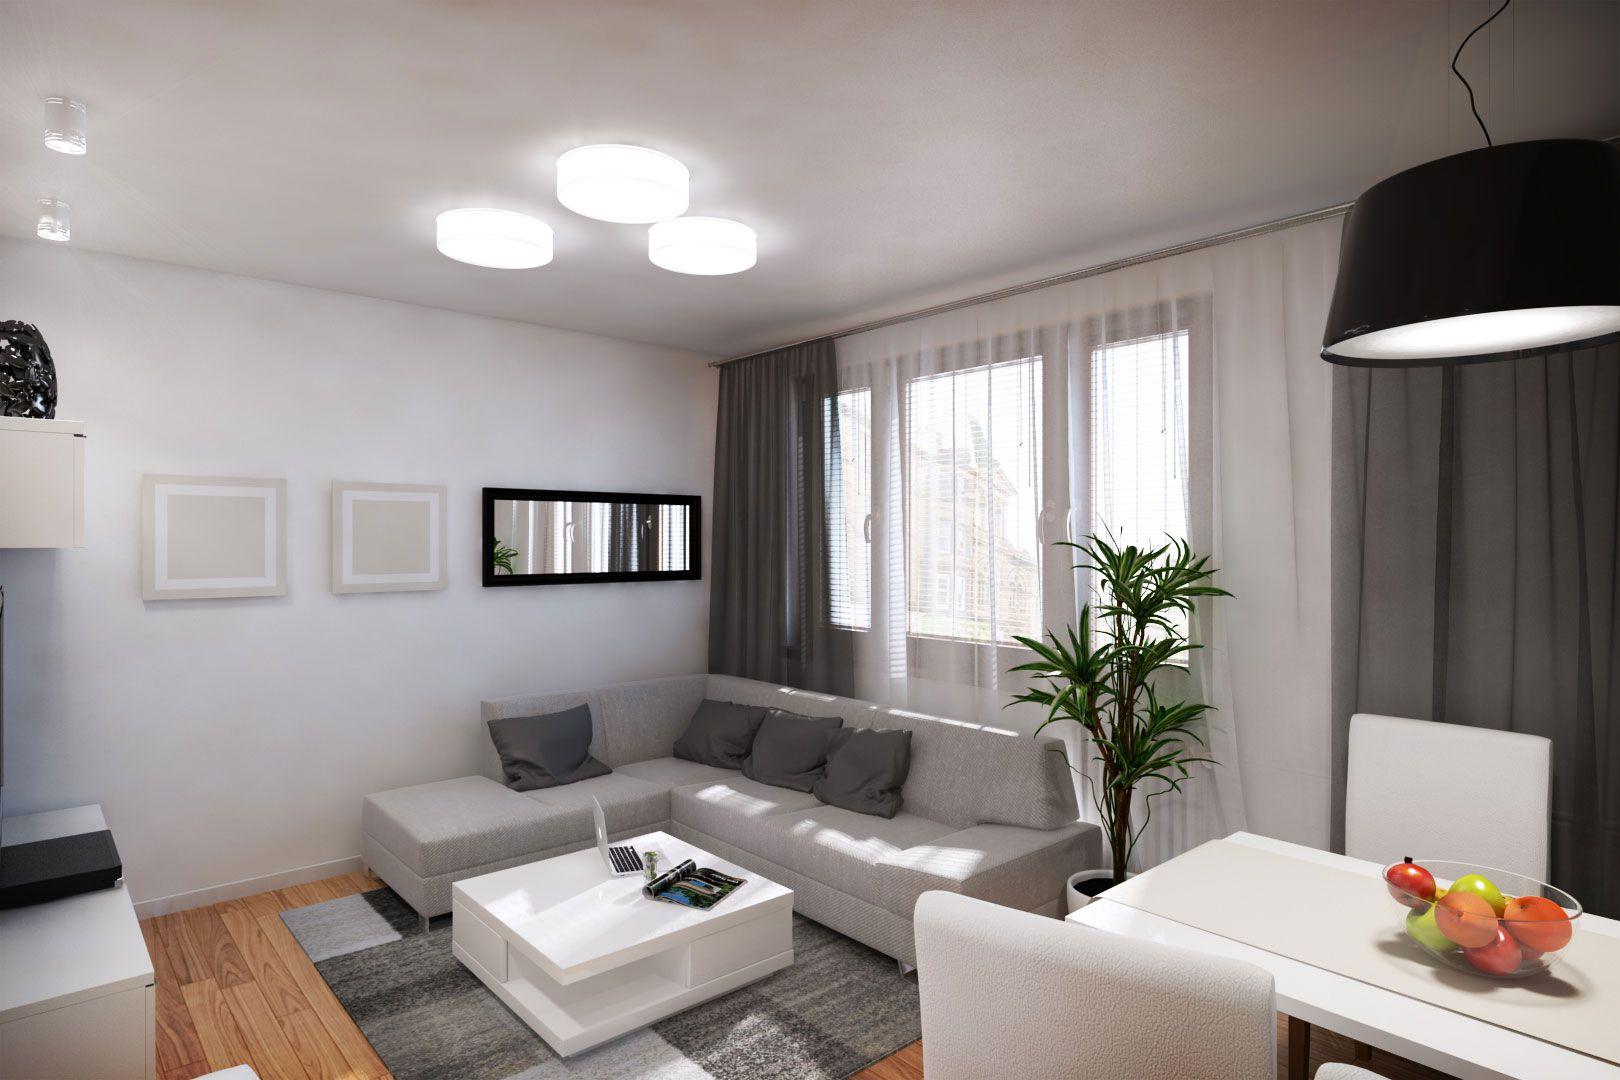 Dise o departamento peque o 62 m planos construye hogar Ideas para decorar departamento pequeno